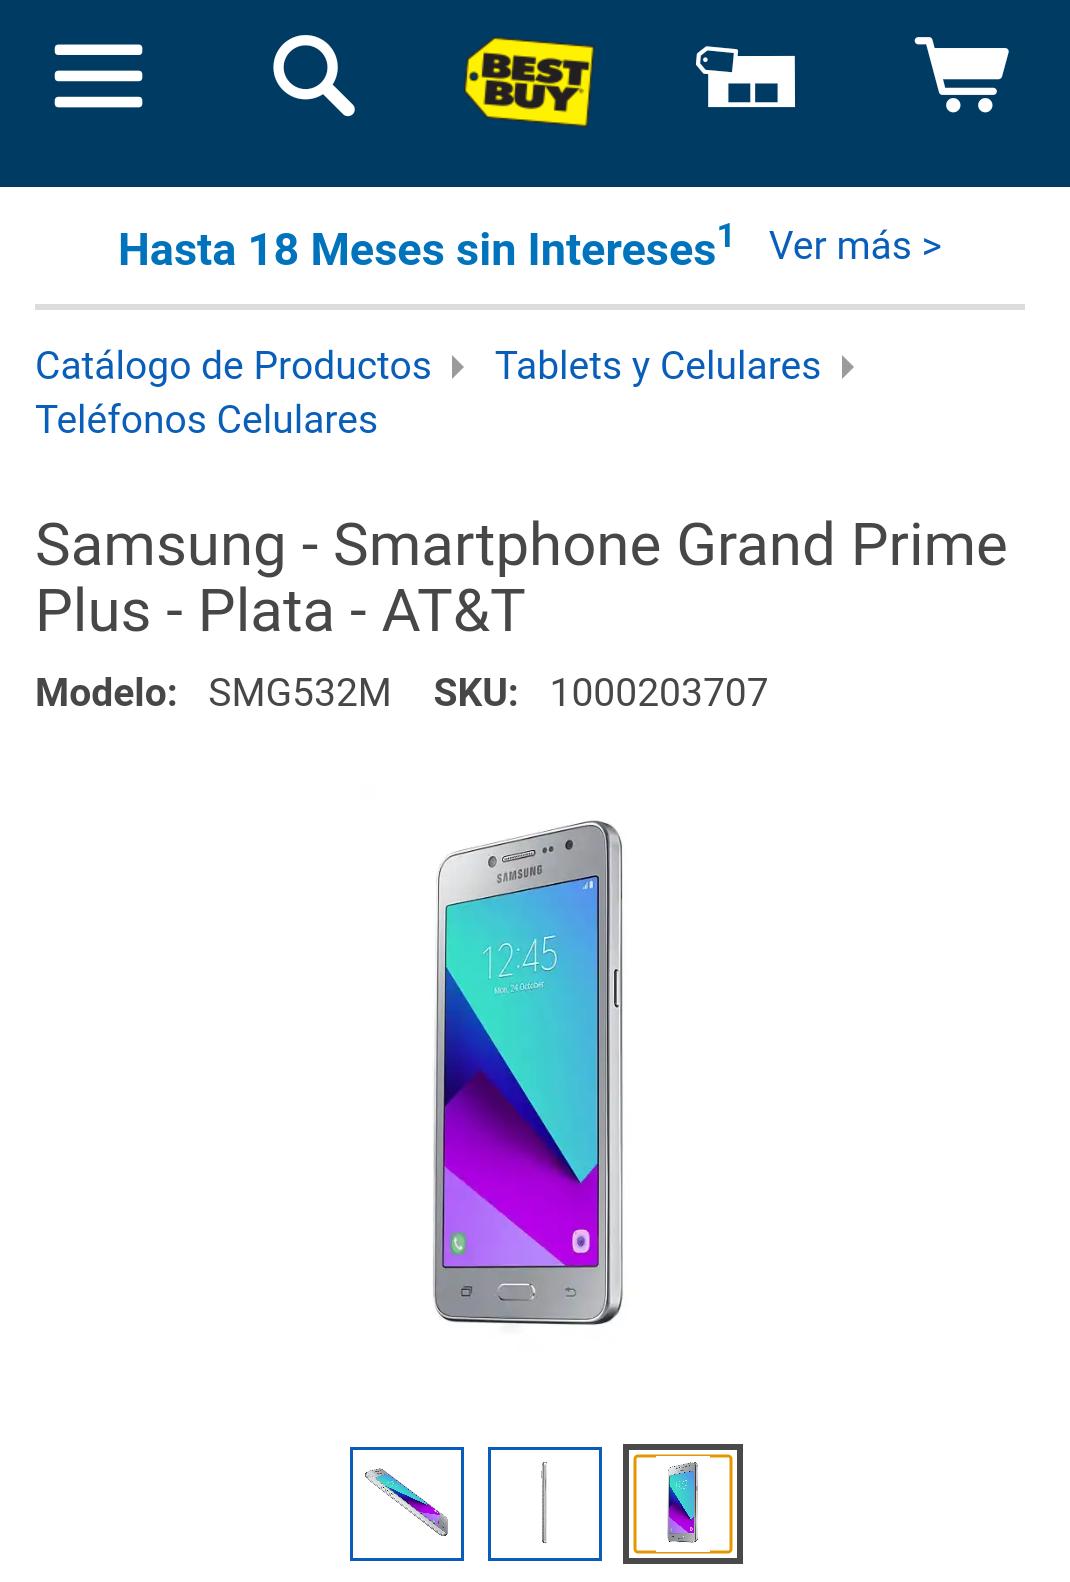 Best Buy: Grand Prime Plus - Plata - AT&T